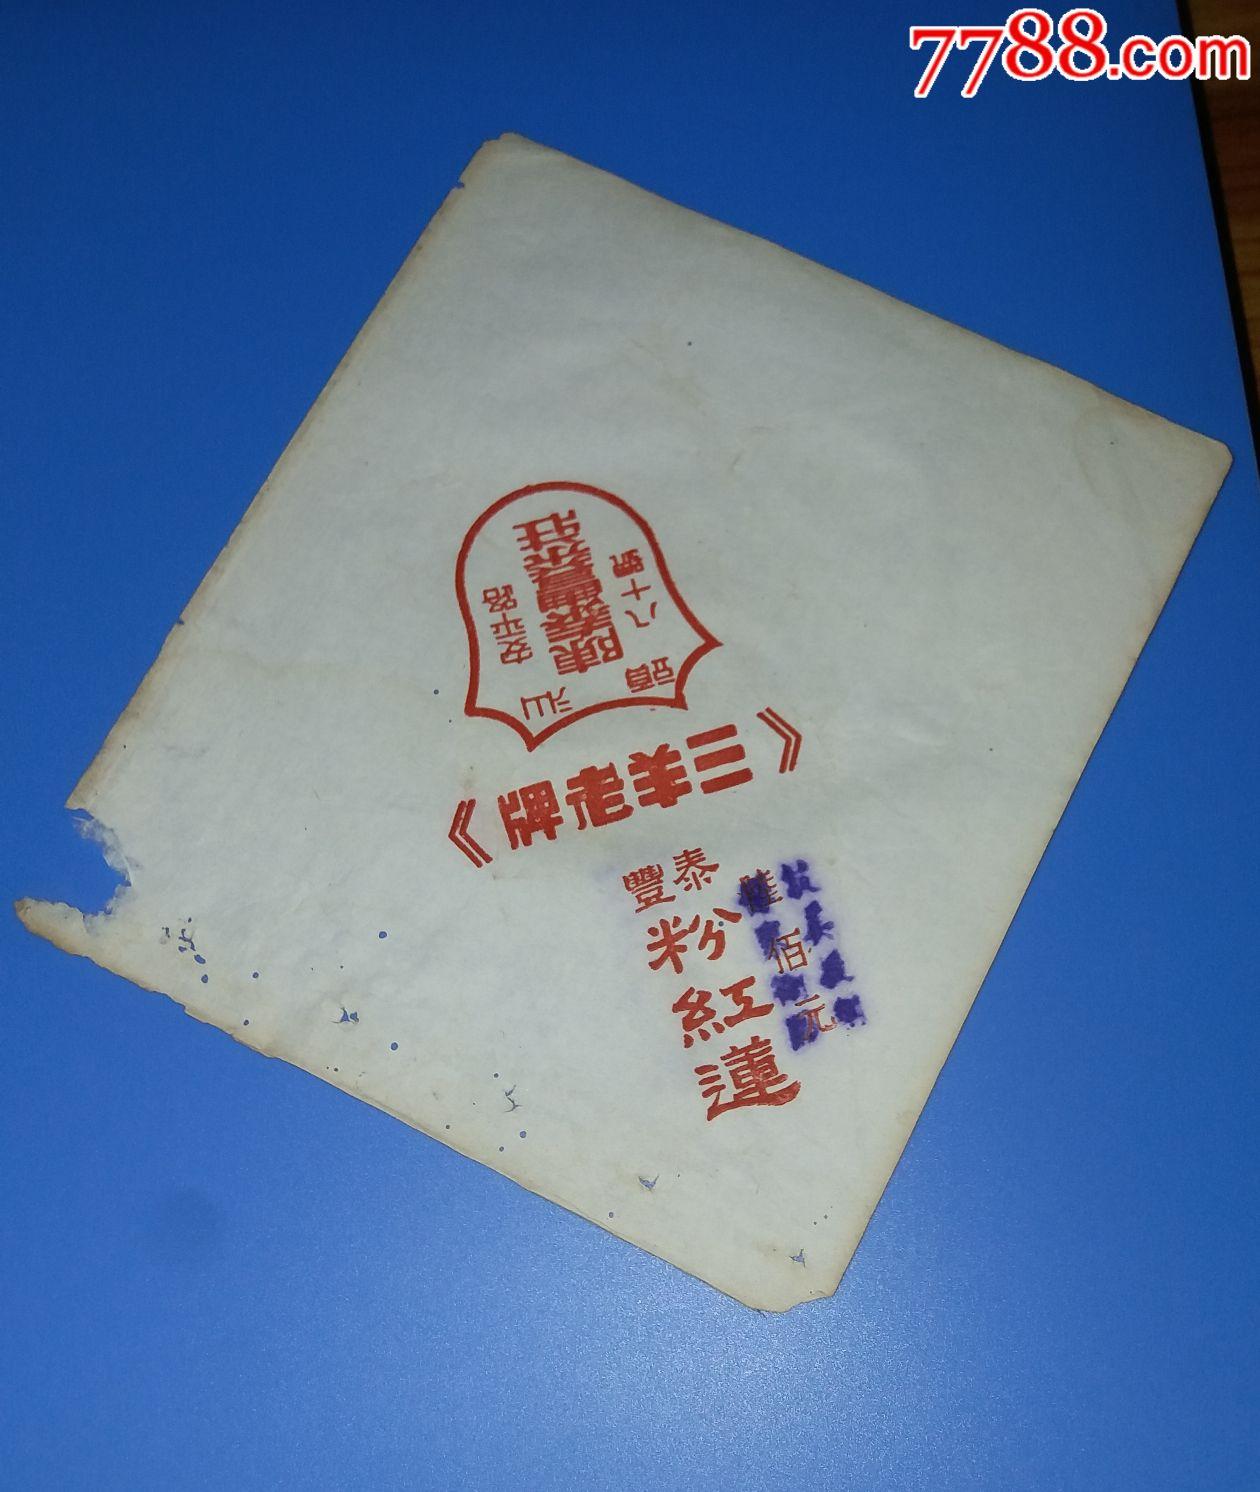 抗美援朝--三羊老牌--�V� 省-汕�^�泰�S茶�f--泰�S粉�t�15.5*16cm(se66718528)_